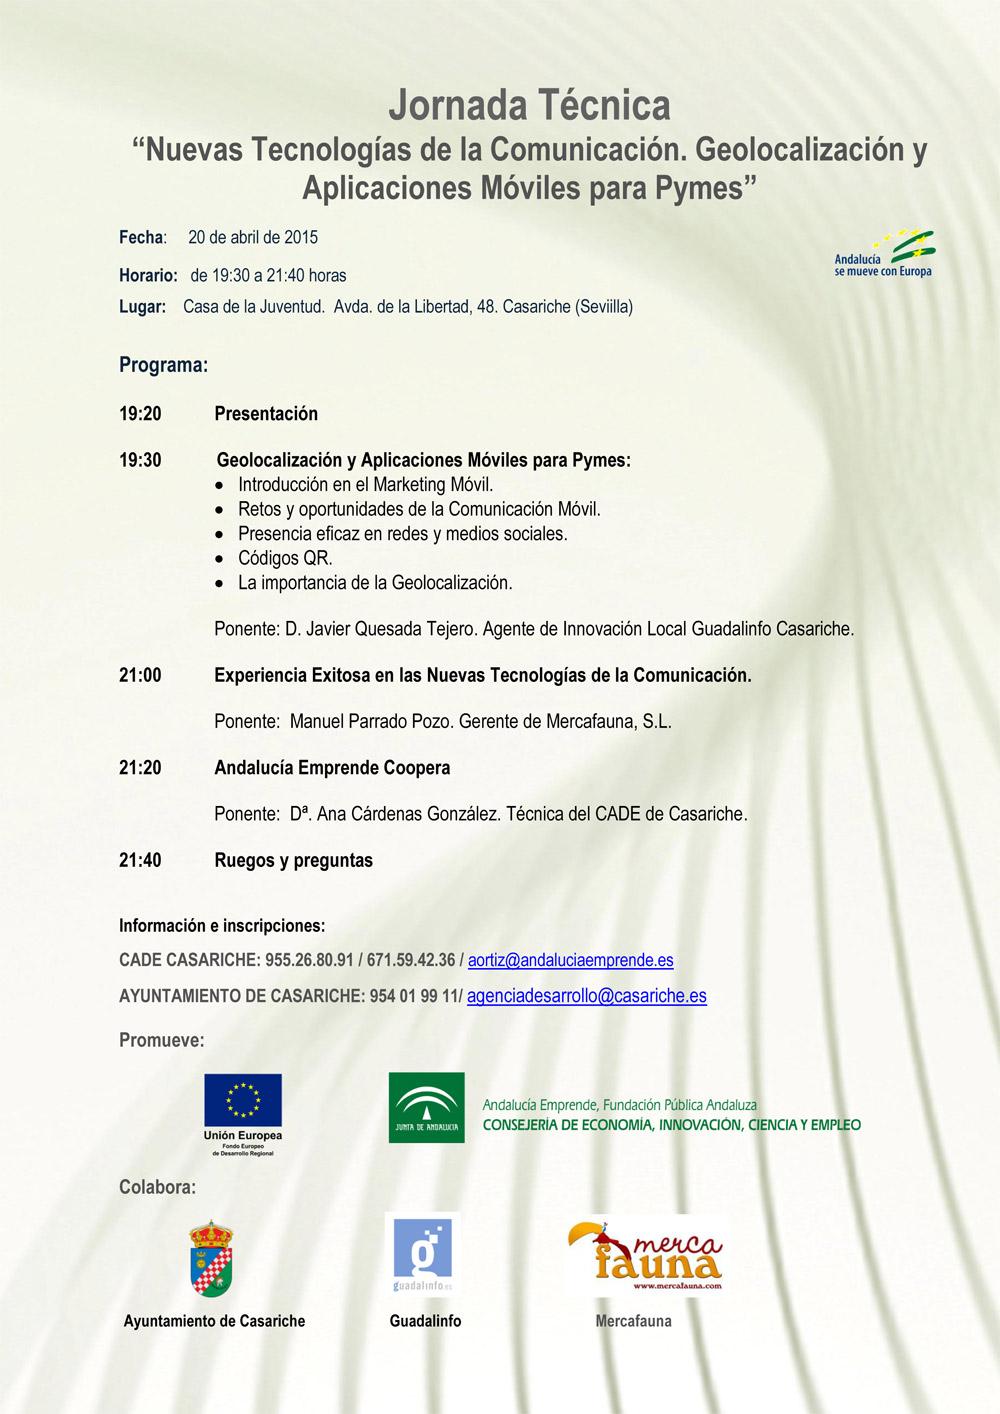 http://www.casariche.es/wp-content/uploads/2015/03/Nuevas-Tecnologias-de-la-Comunicaci%C3%B3n.Casariche.jpg